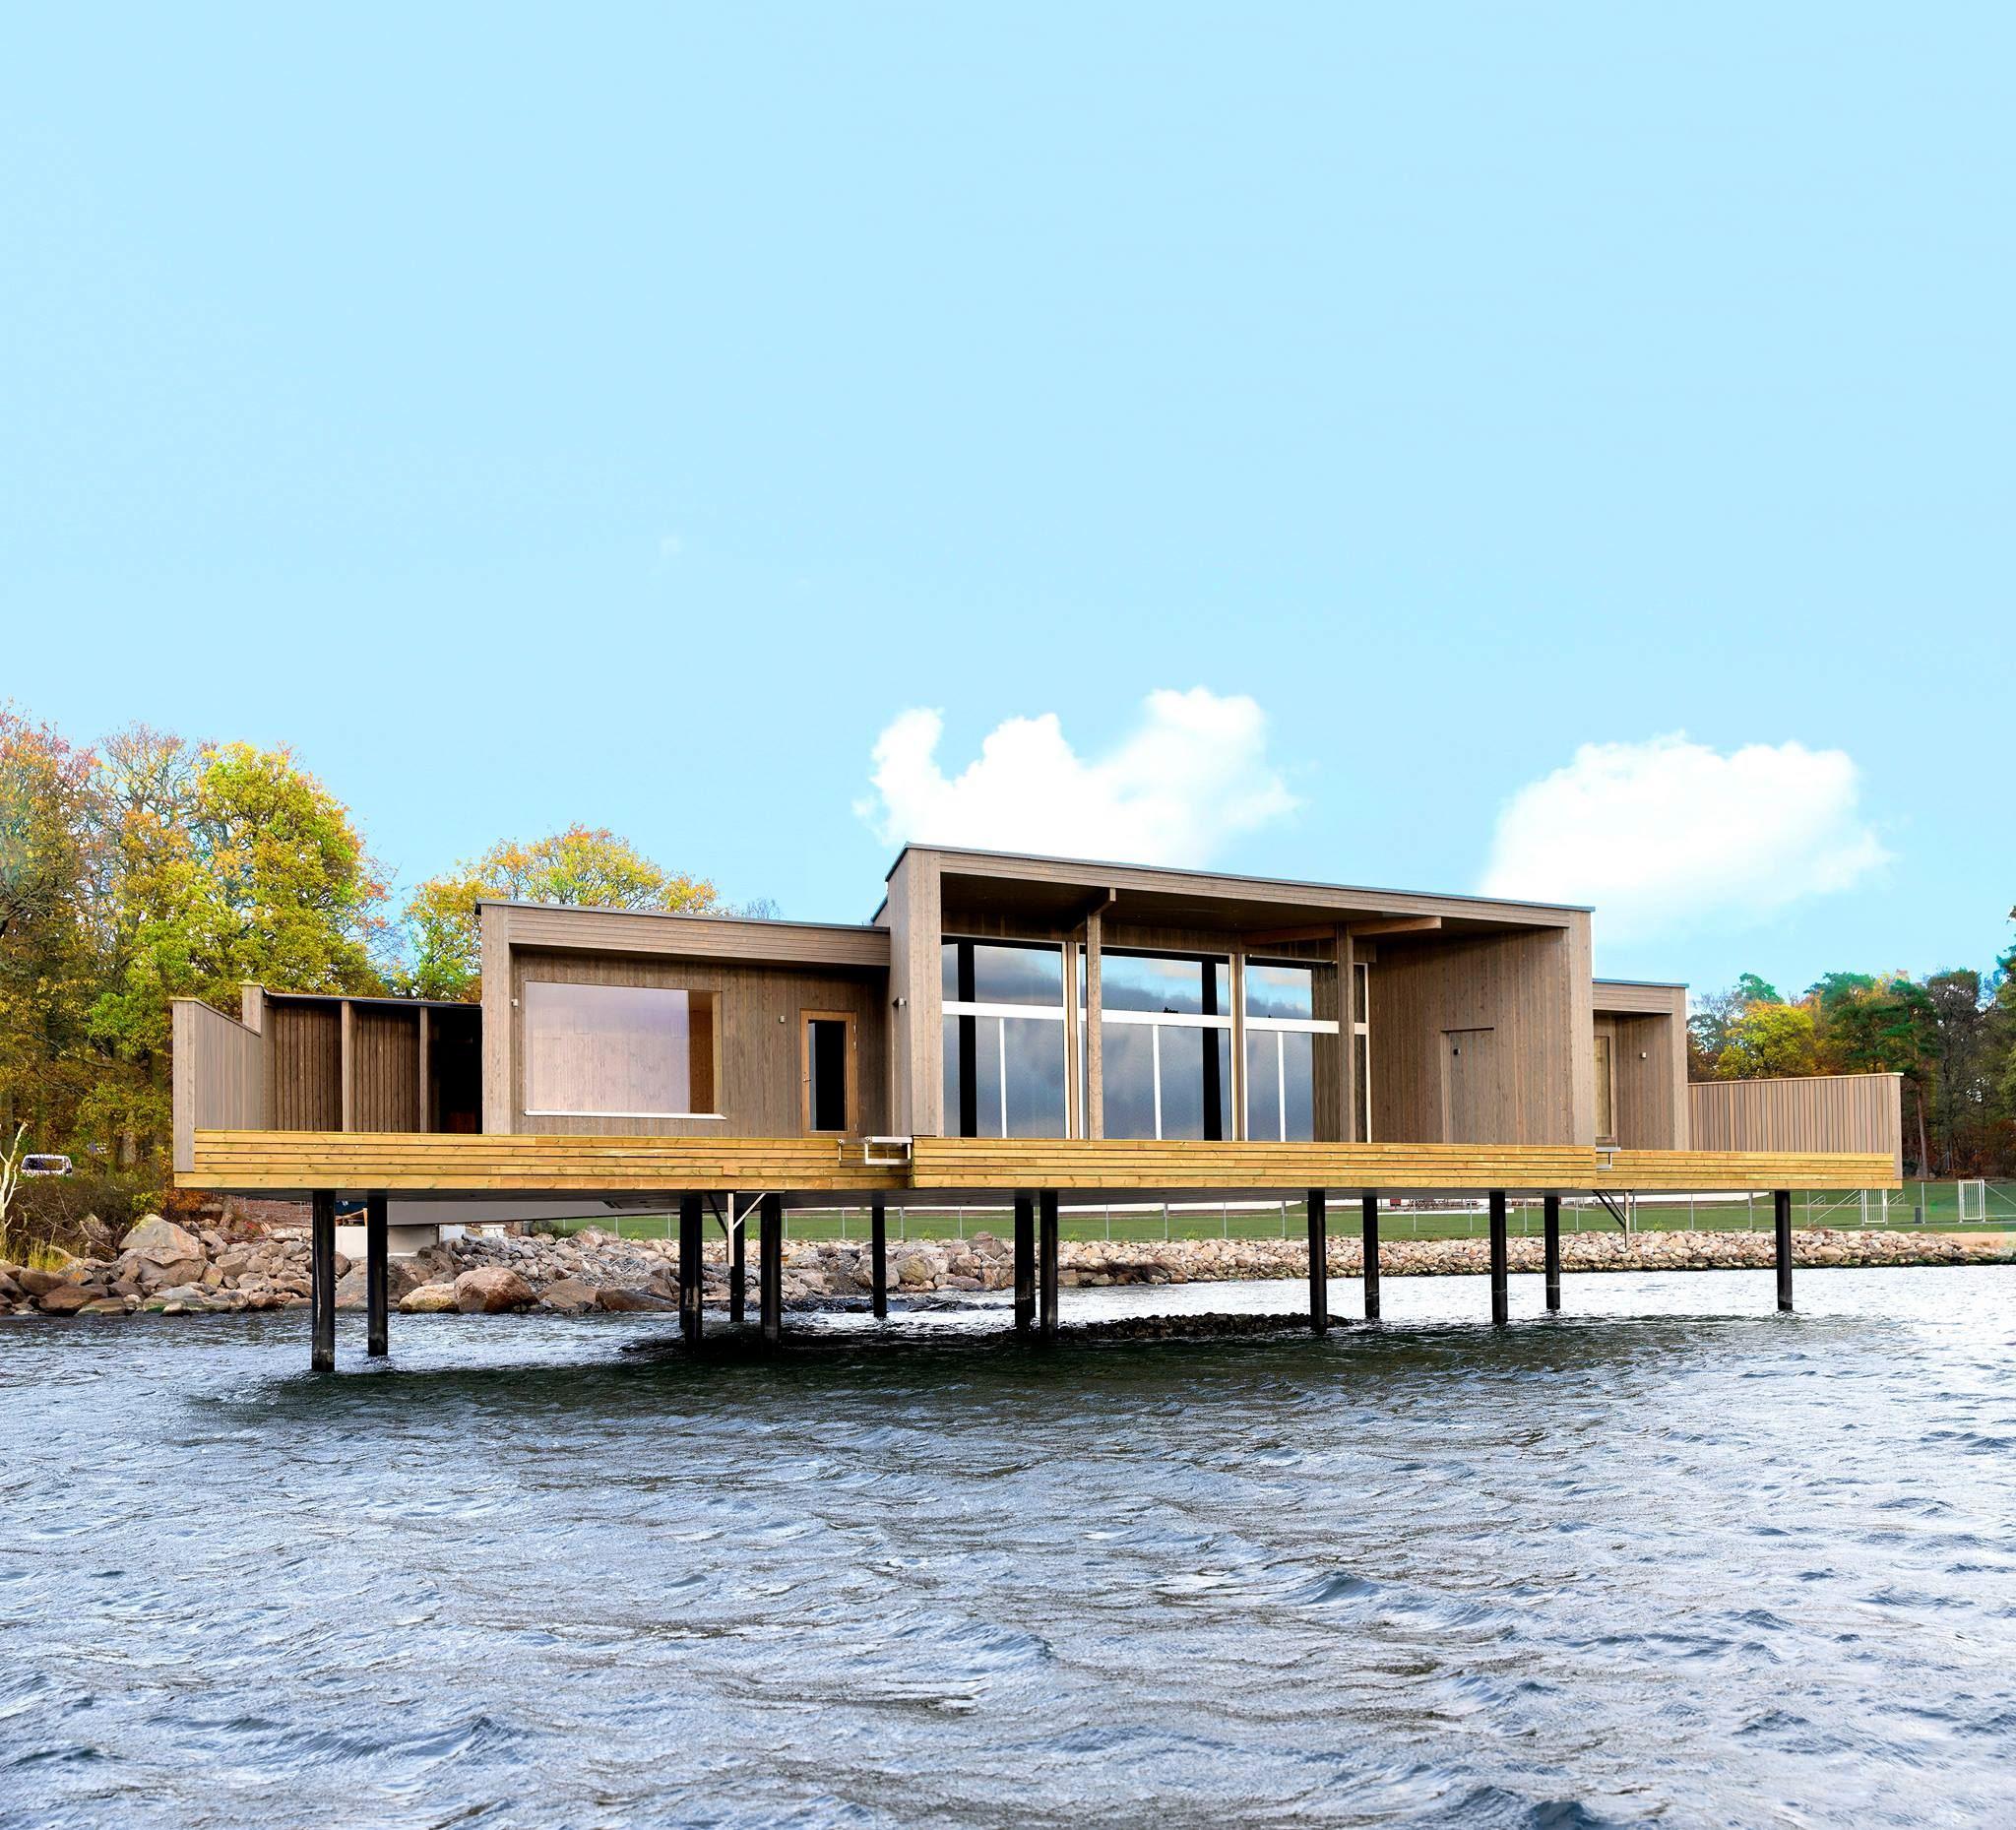 Kallbadhuset - Outdoor swimming bath